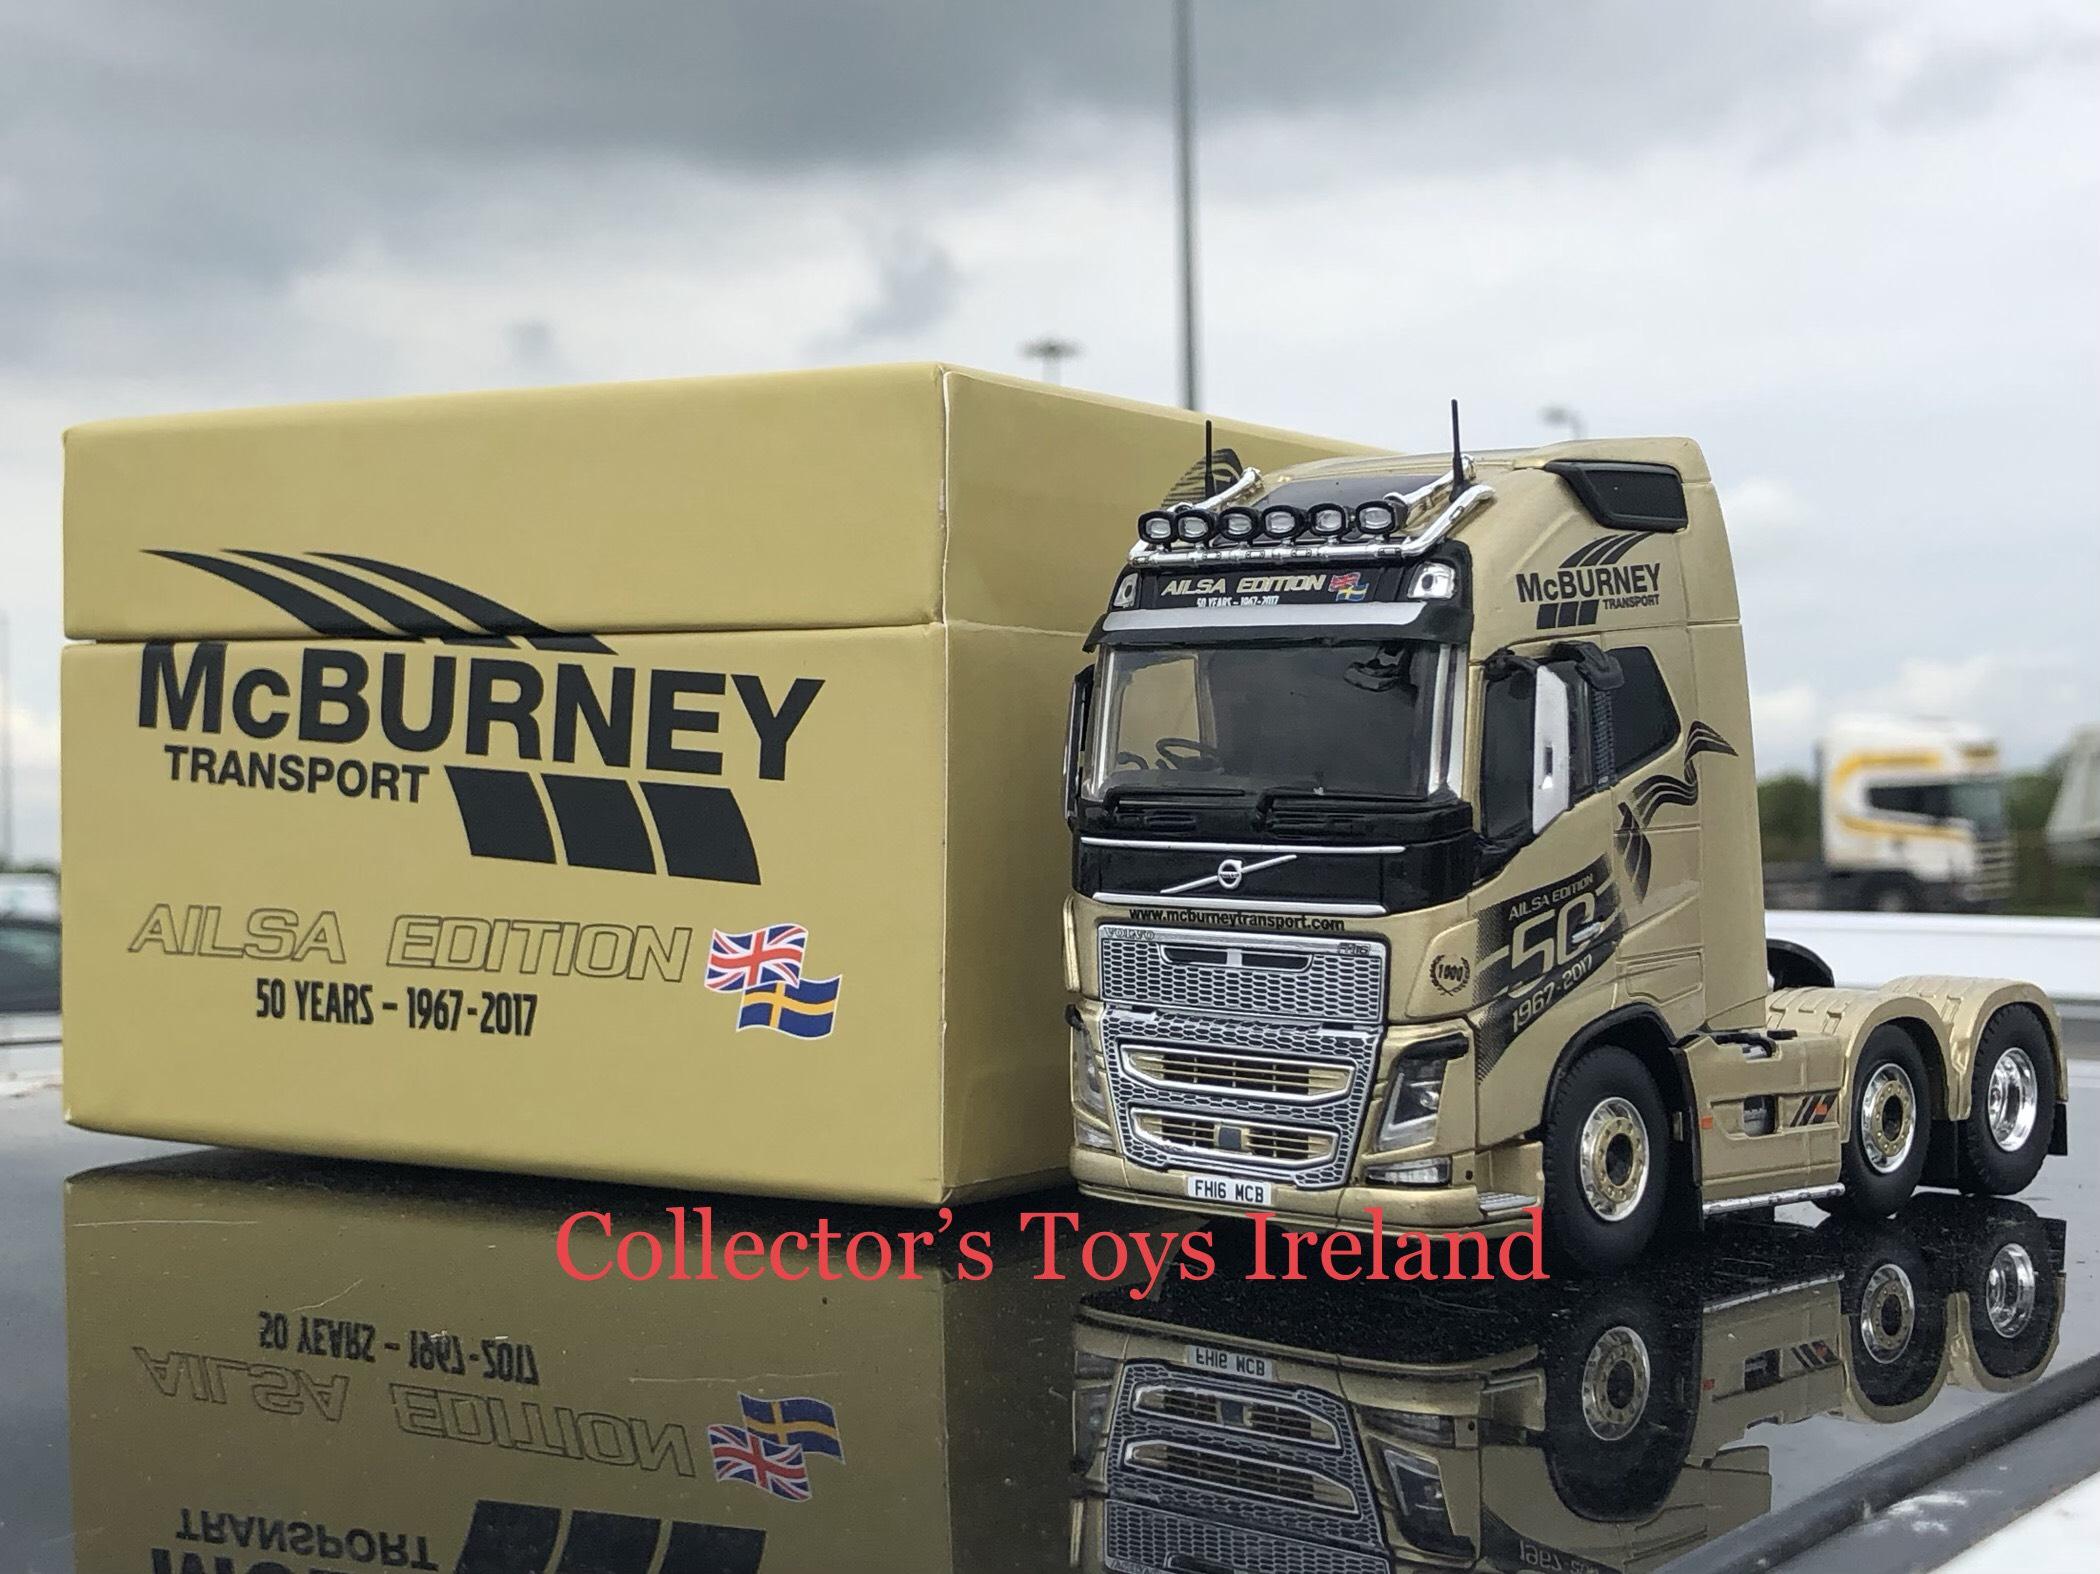 McBurney Transport (Golden Ailsa Edition) - €145